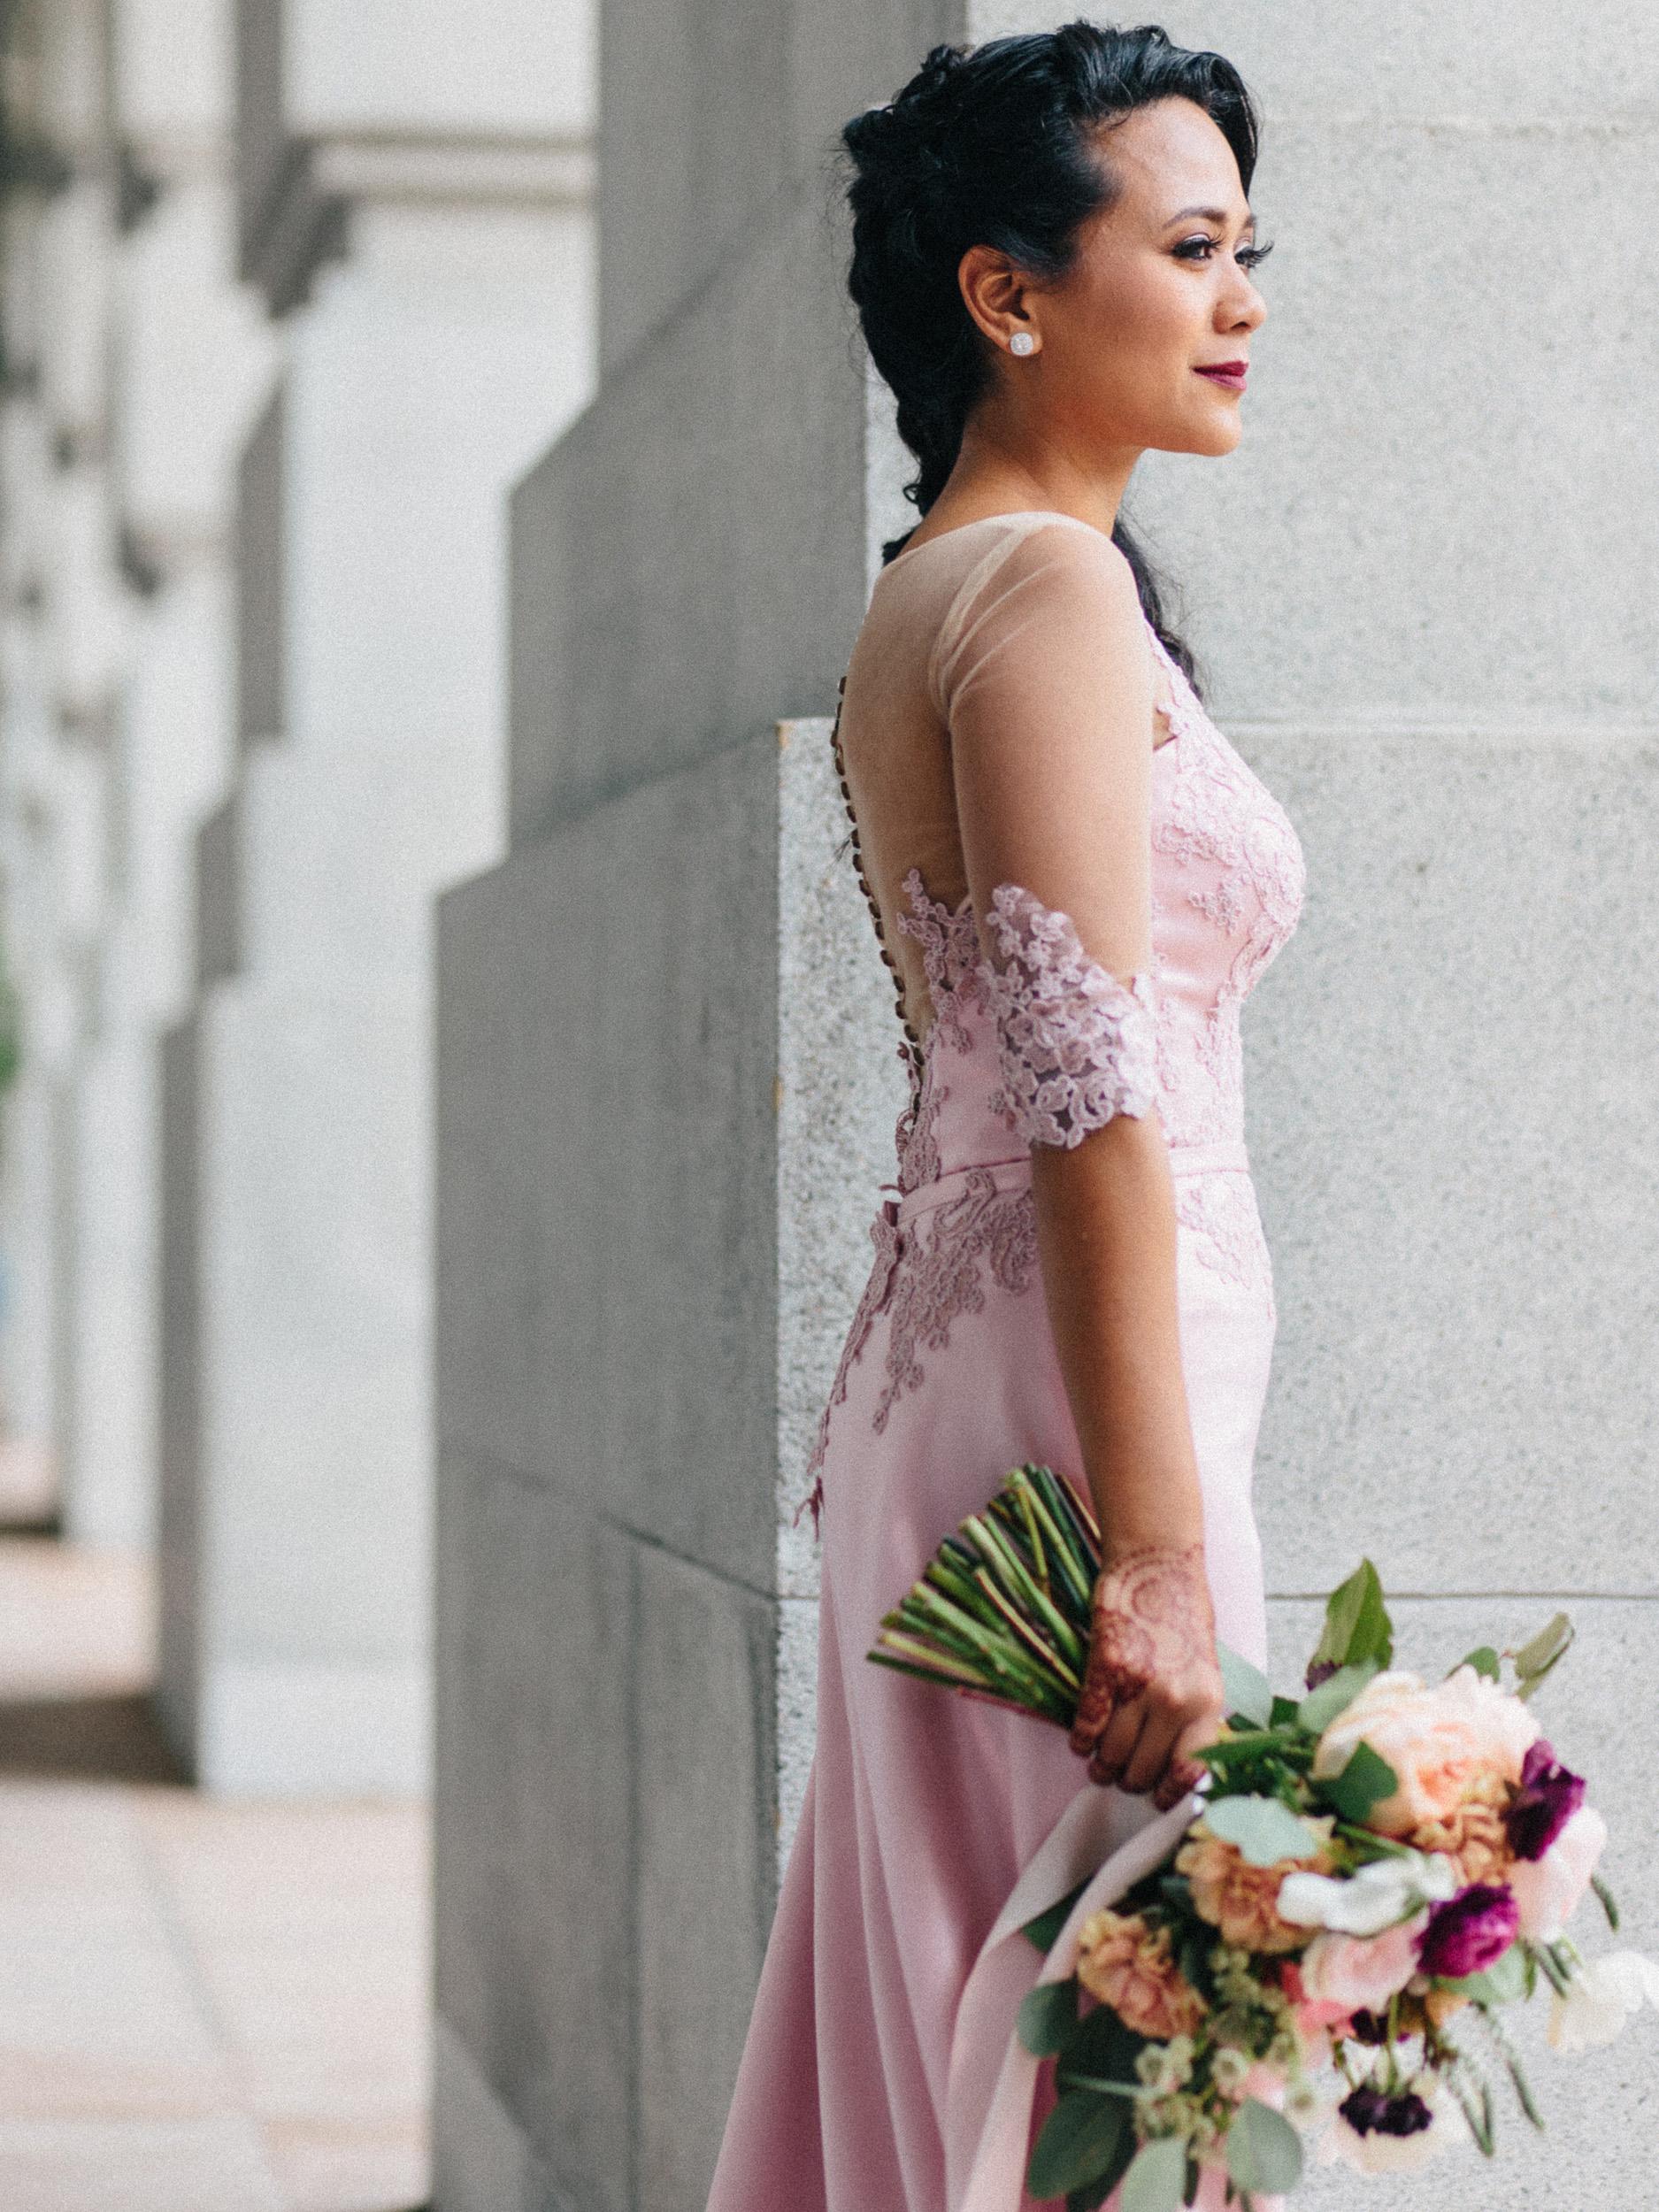 singapore-wedding-photographer-photography-wmt2017-046.jpg